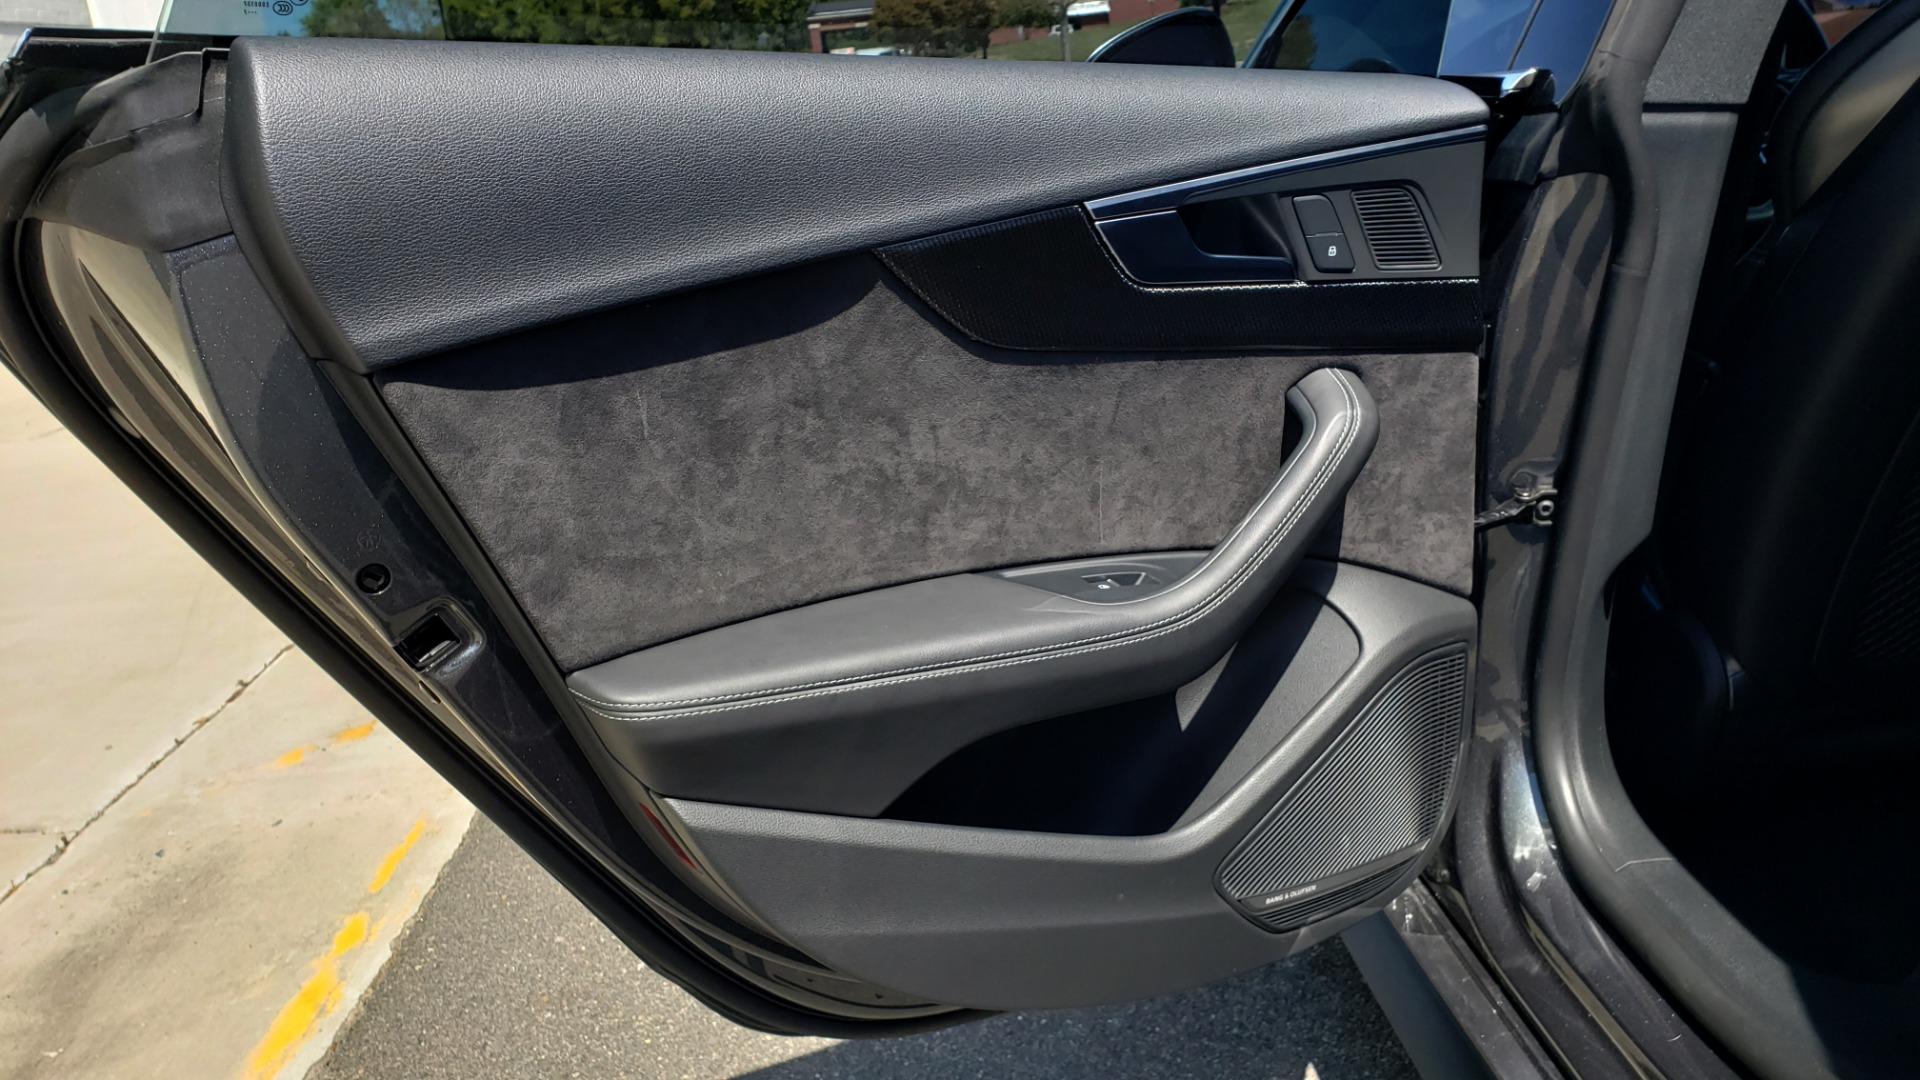 Used 2018 Audi S5 SPORTBACK PRESTIGE S-SPORT / NAV / SUNROOF / HUD / B&O SND / REARVIEW for sale $48,995 at Formula Imports in Charlotte NC 28227 50